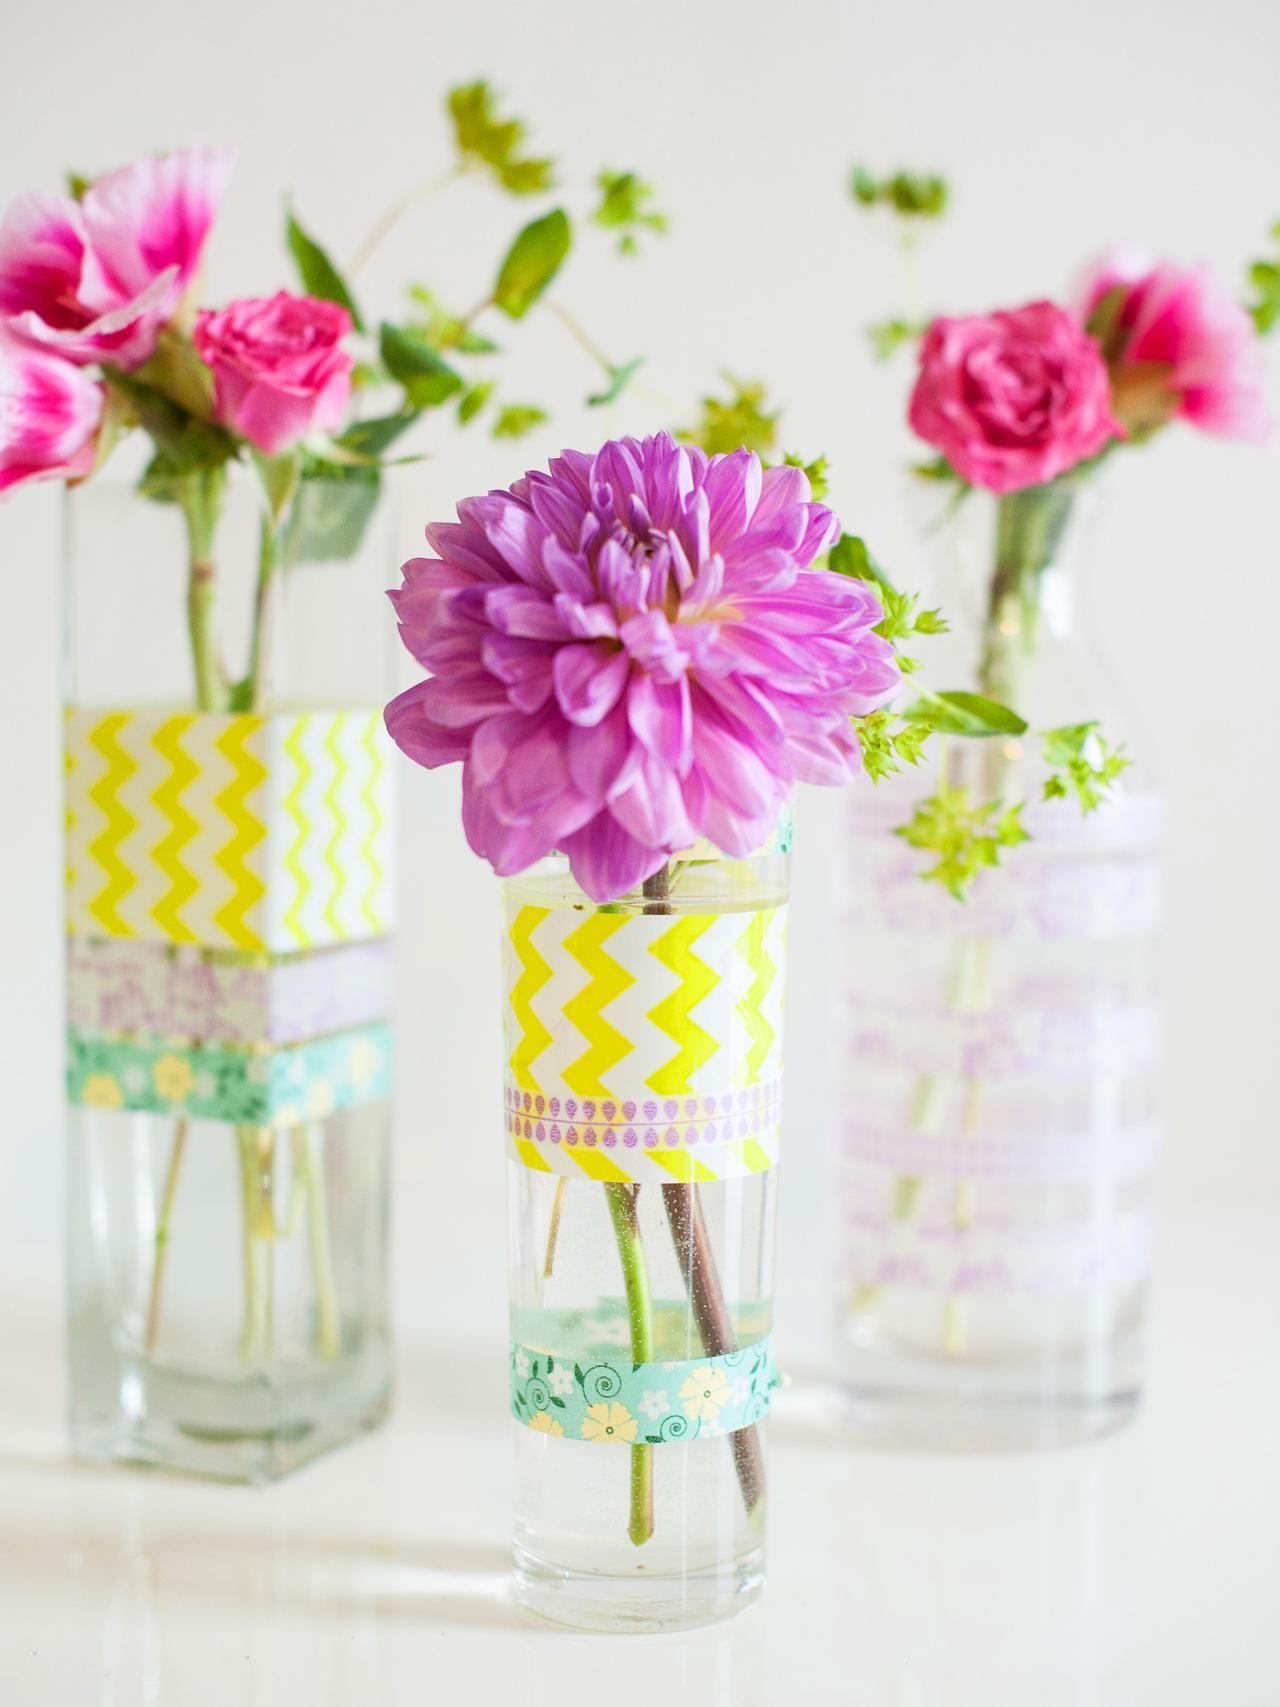 24 Gorgeous DIY Wedding Decor Ideas   DIY wedding, Centerpieces and ...